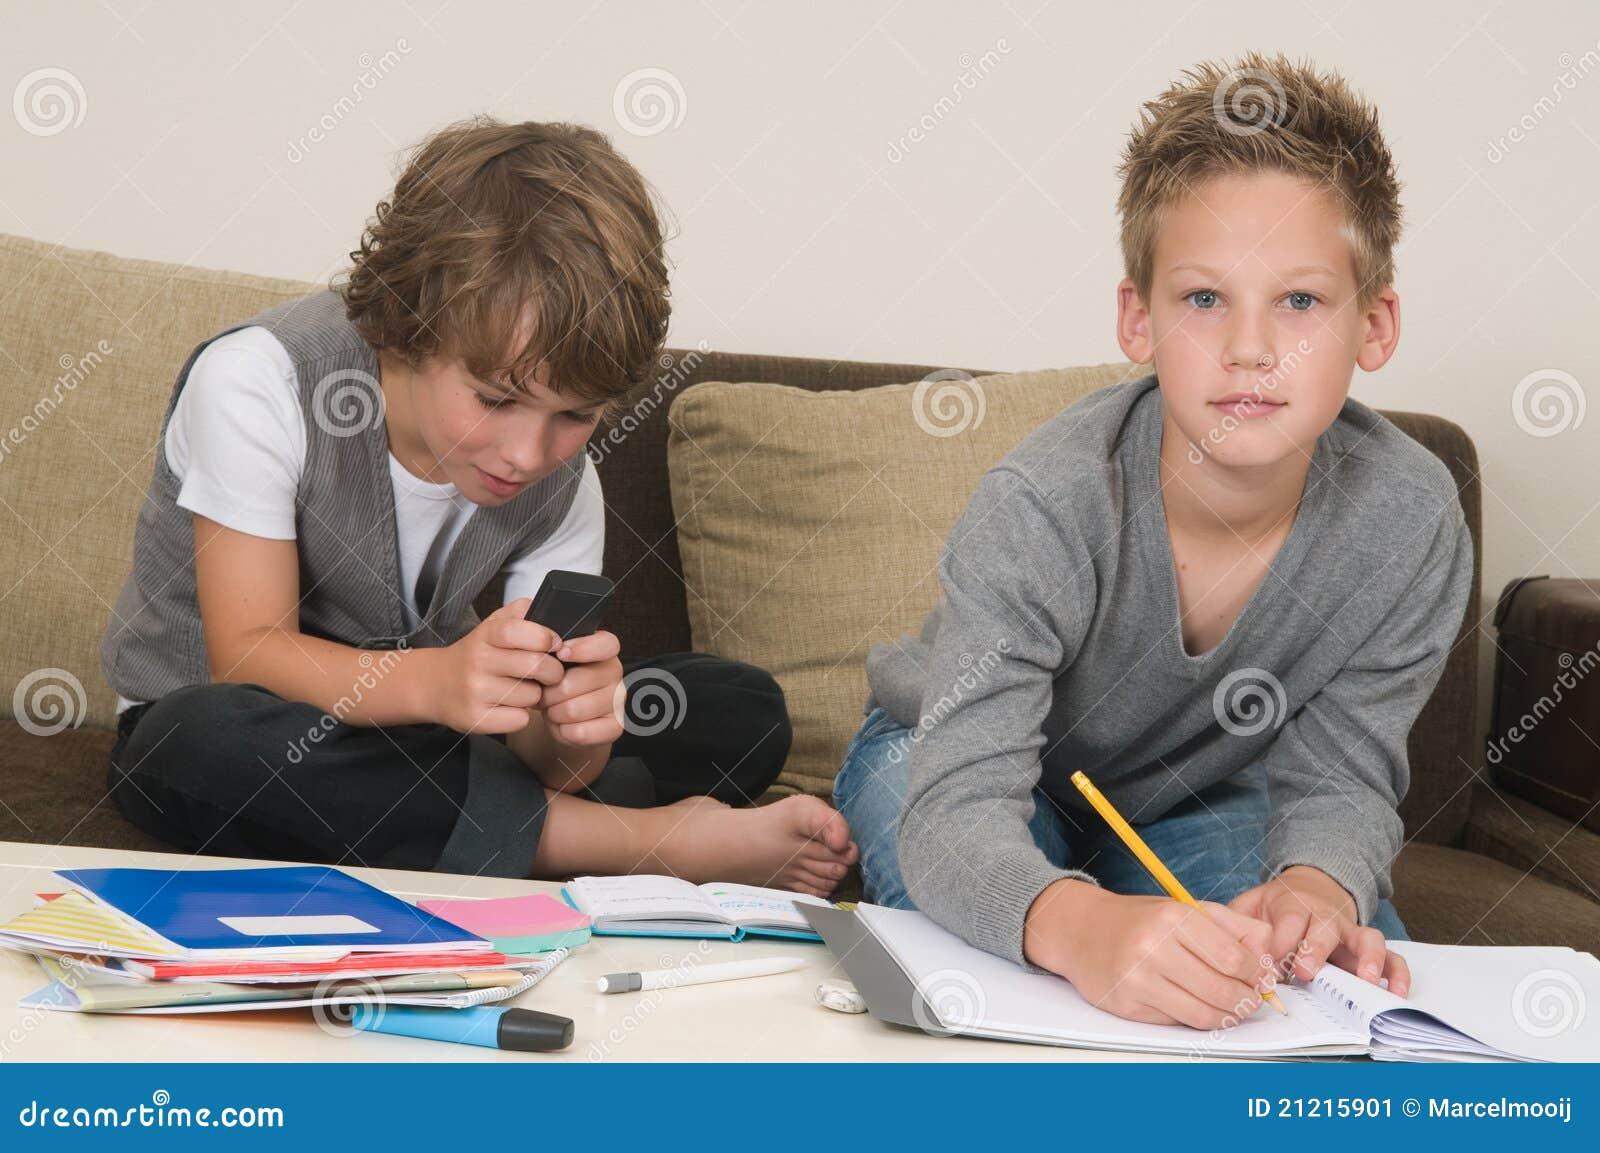 Doing homework while gaming